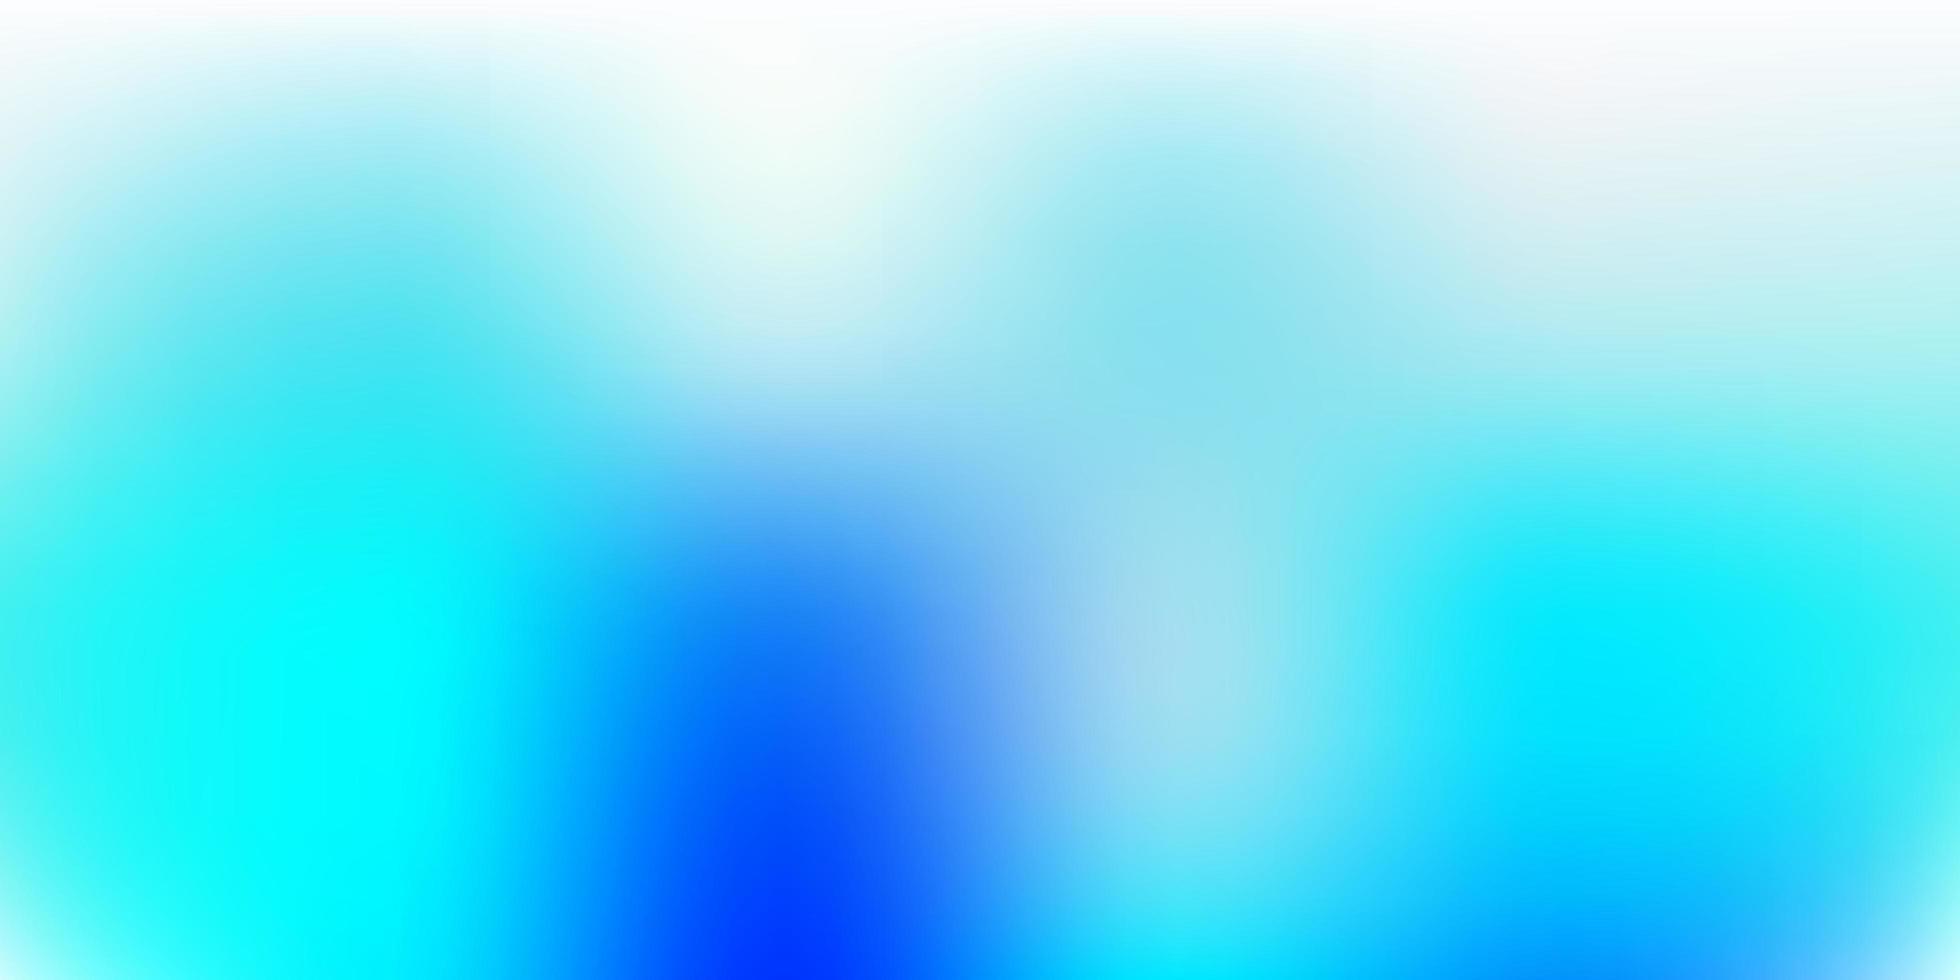 dibujo de desenfoque de vector azul claro.